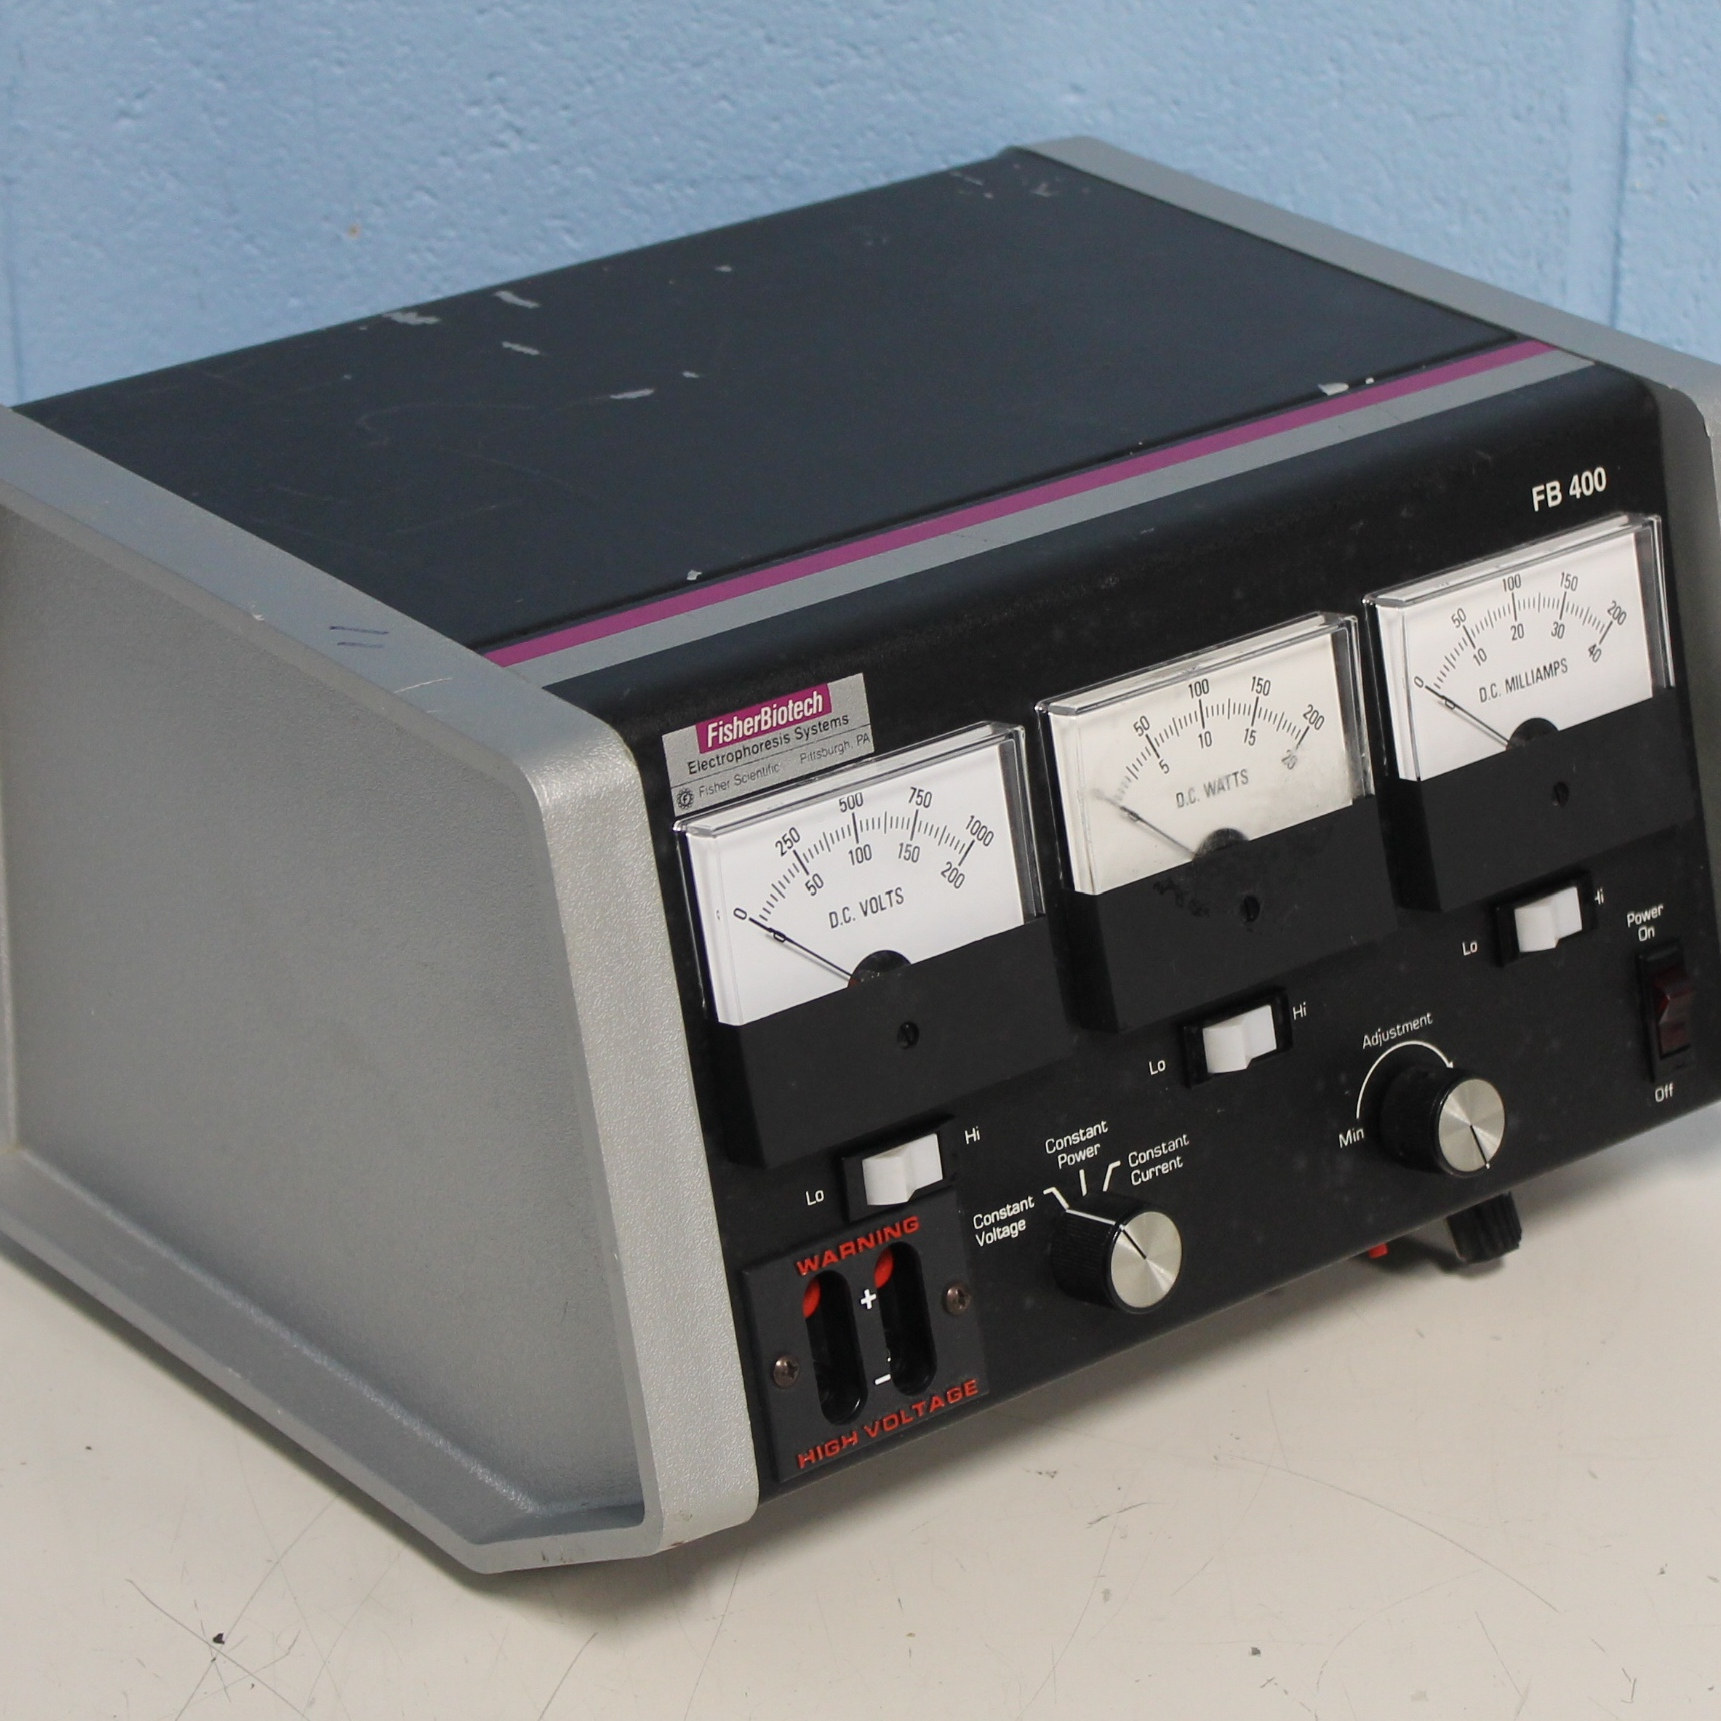 Fisher Biotech FB 400 Electrophoresis System Image